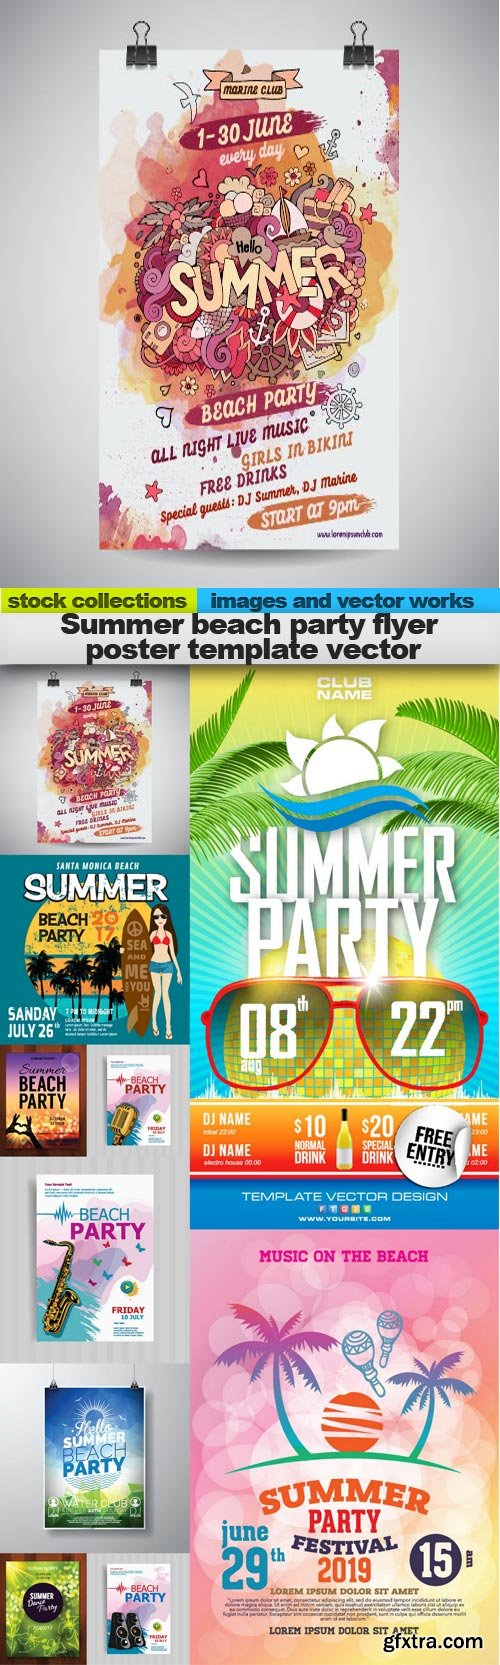 Summer beach party flyer poster template vector, 10 x EPS